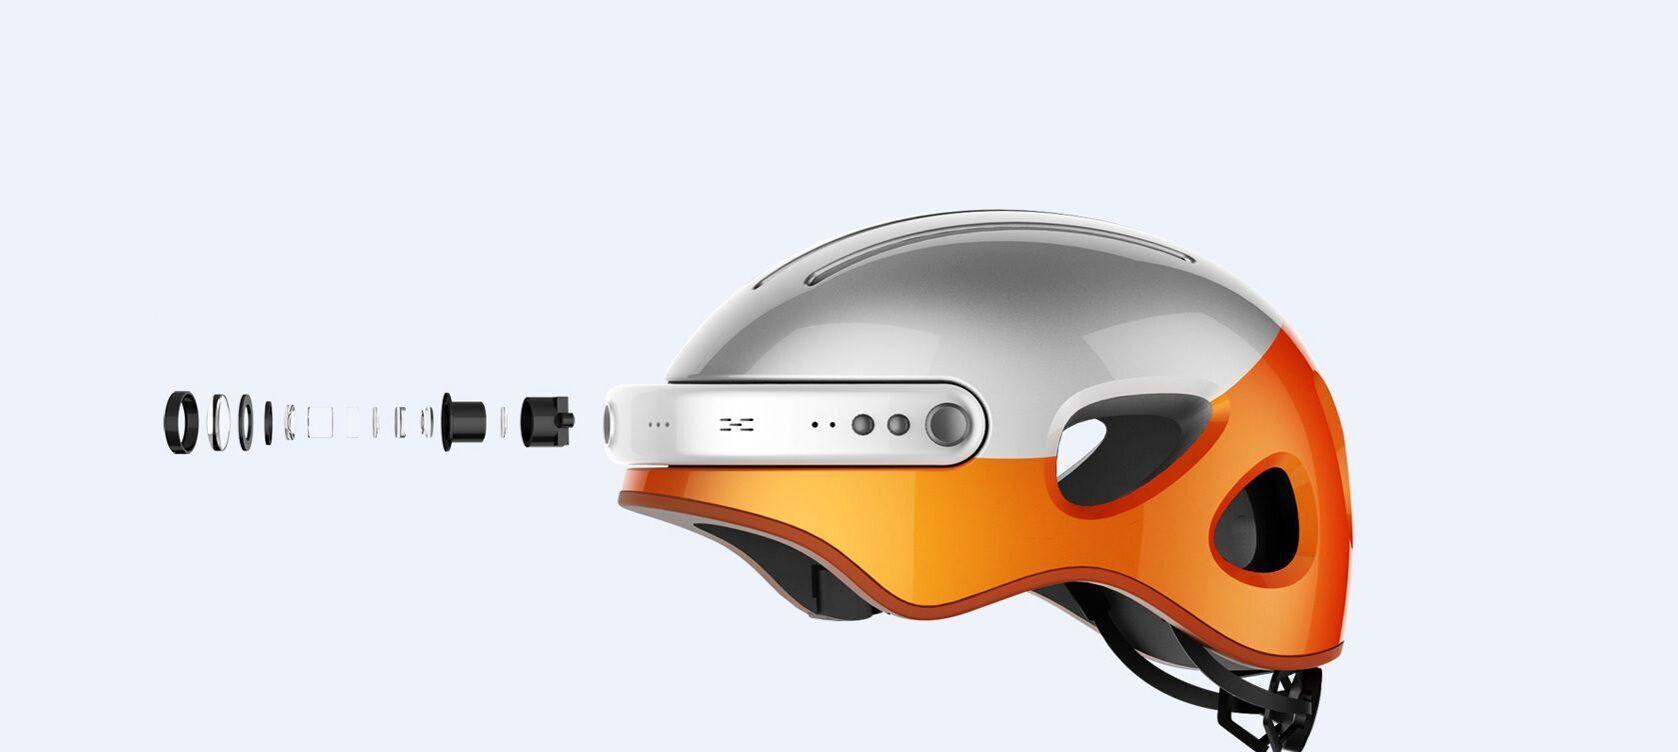 шлем с камерой airwheel